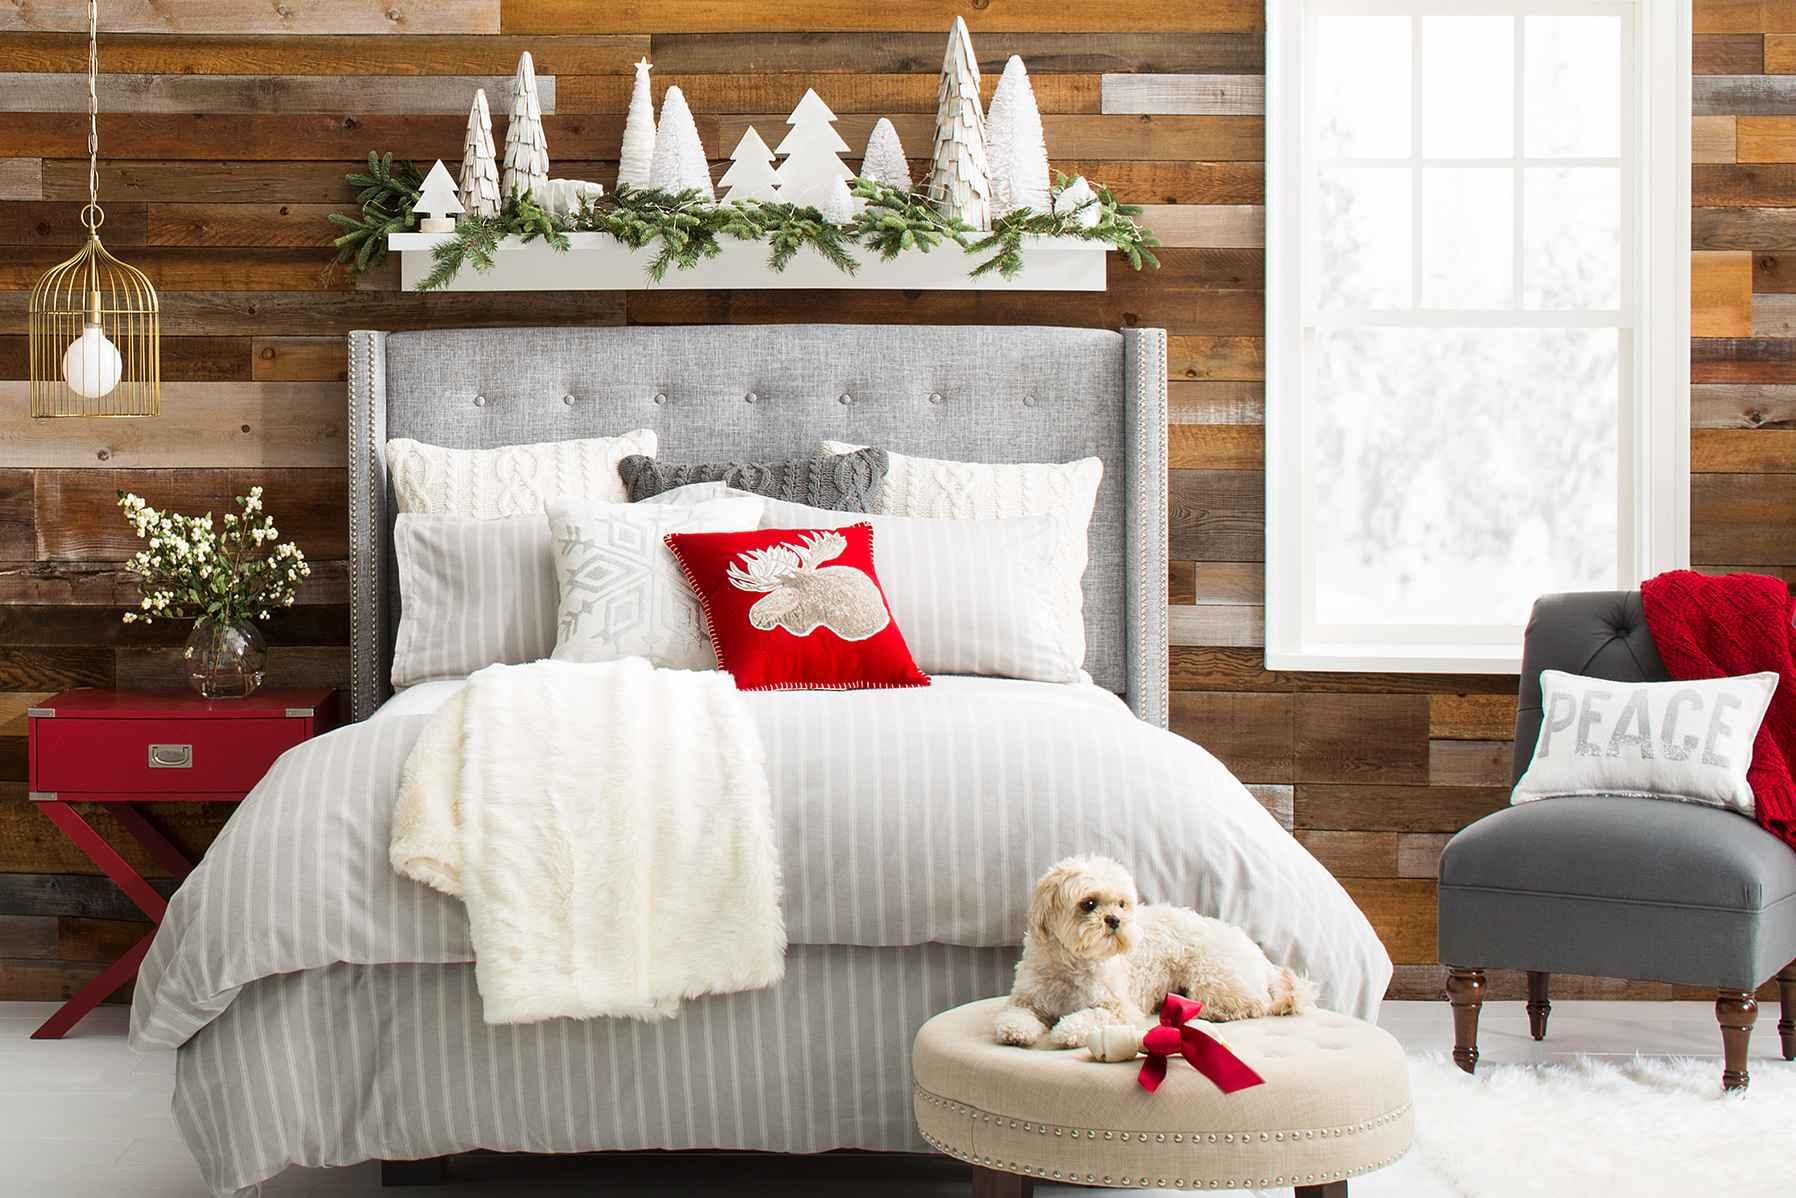 target-bedding-deal